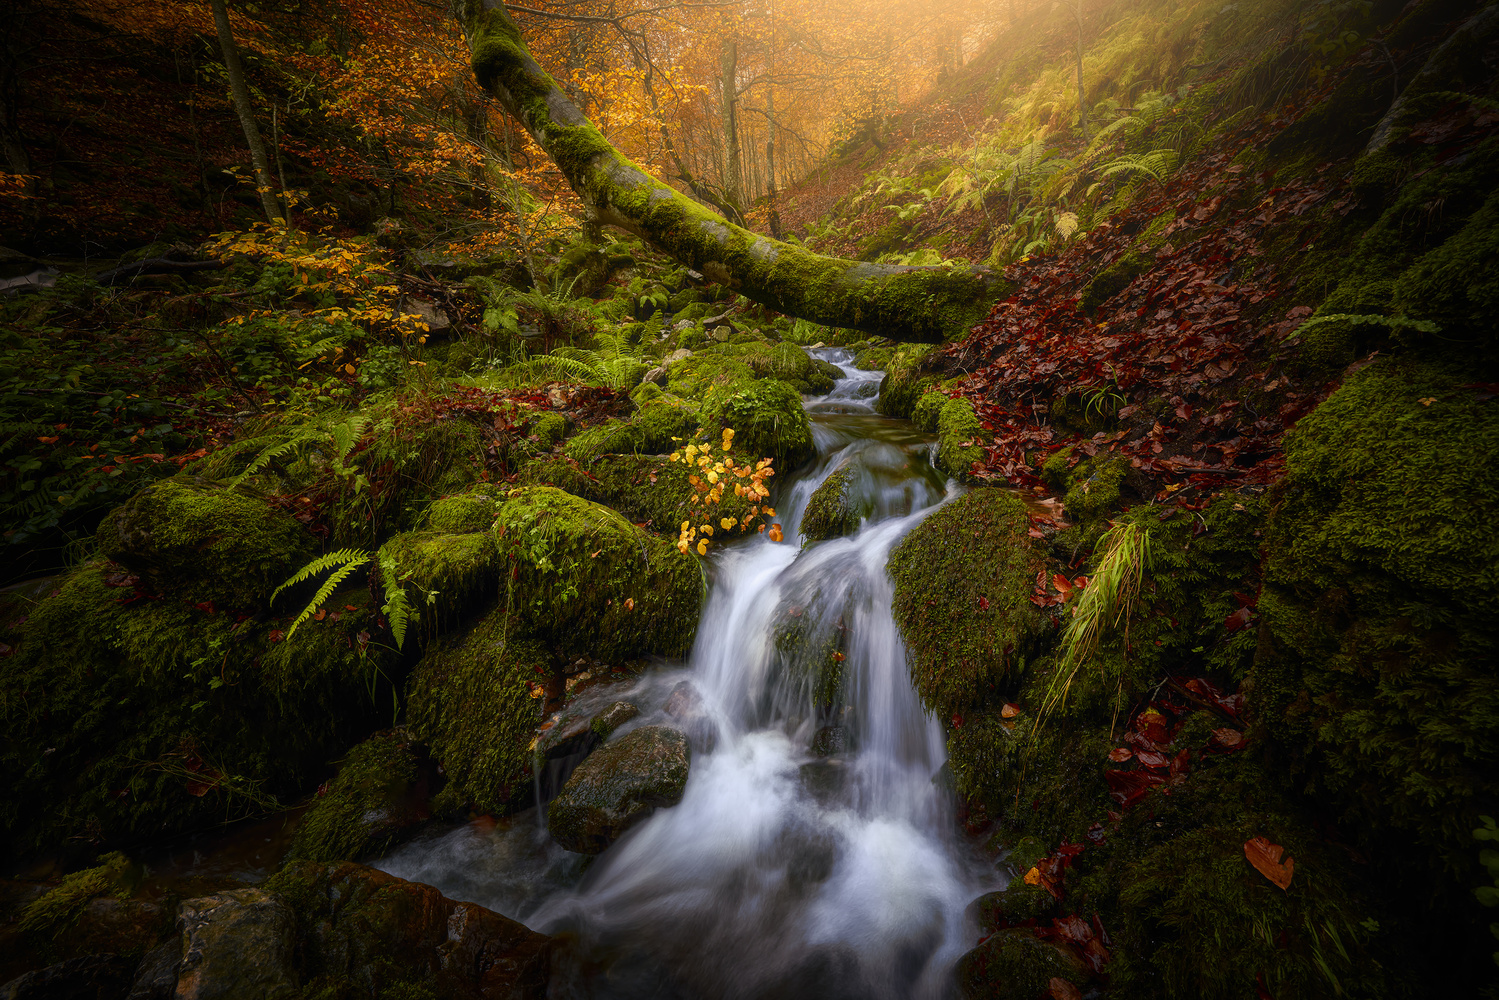 Autumn in Argovejo by Ignacio Municio